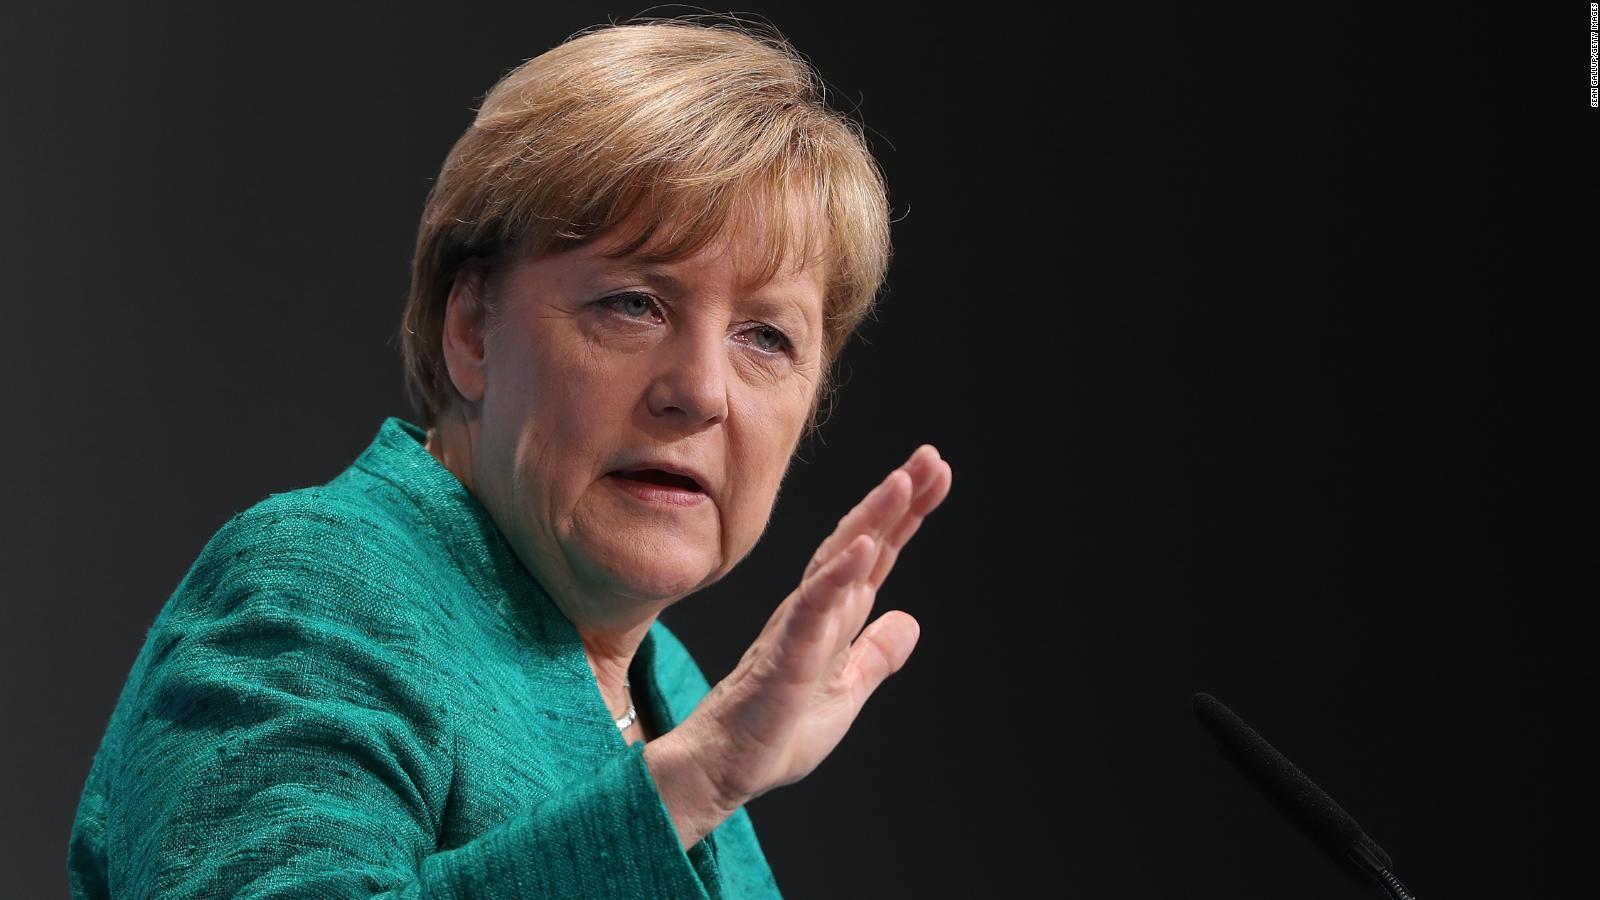 Merkel Wallpaper